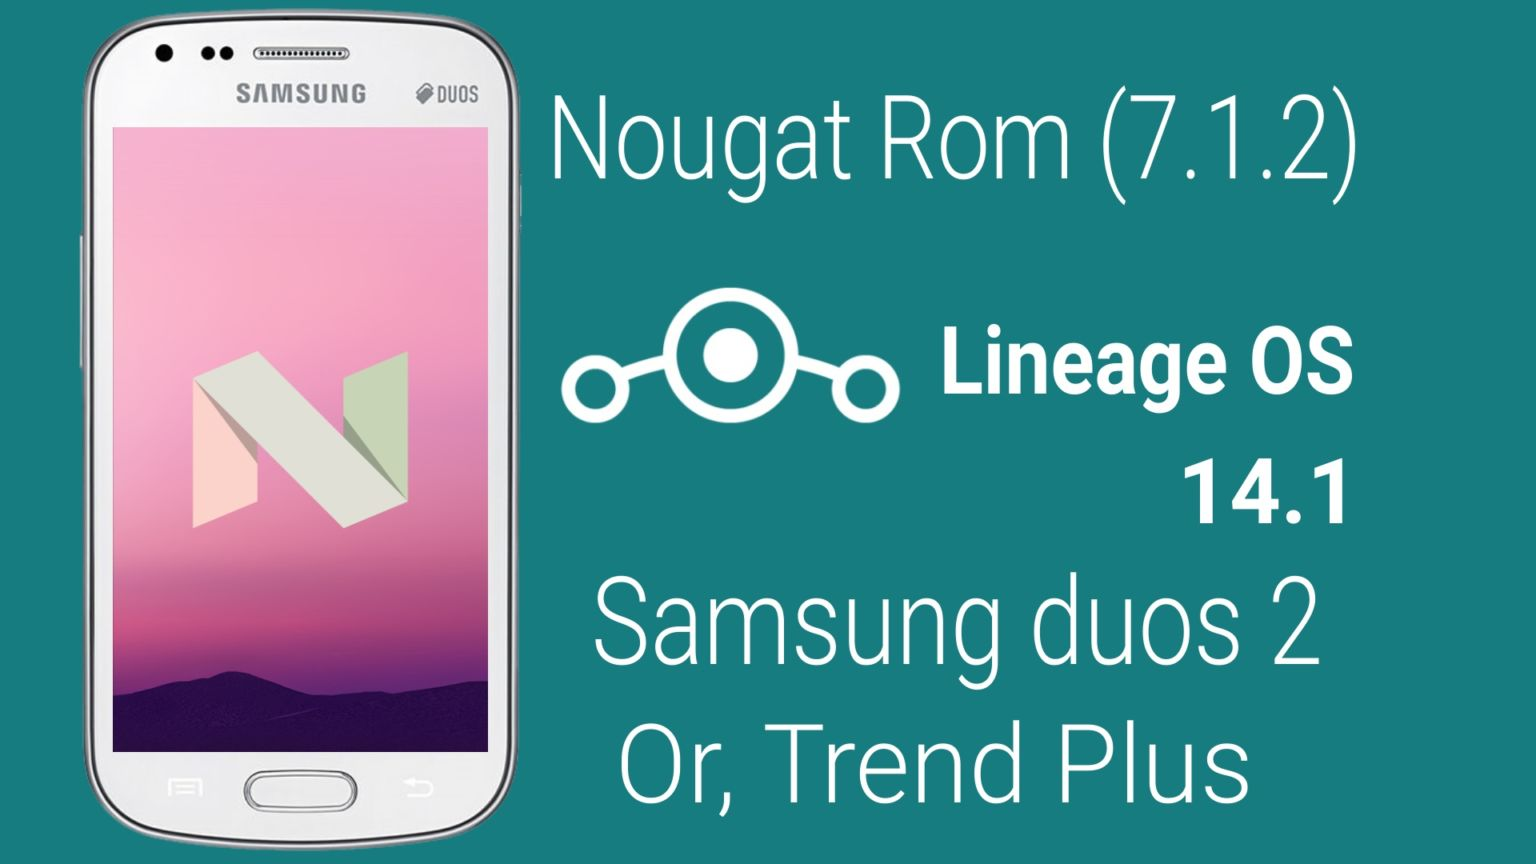 Lineage 14.1 (Nougat) রম আপনার Samsung Galaxy S Duos 2/Trend Plus ফোনের জন্য by Rocky